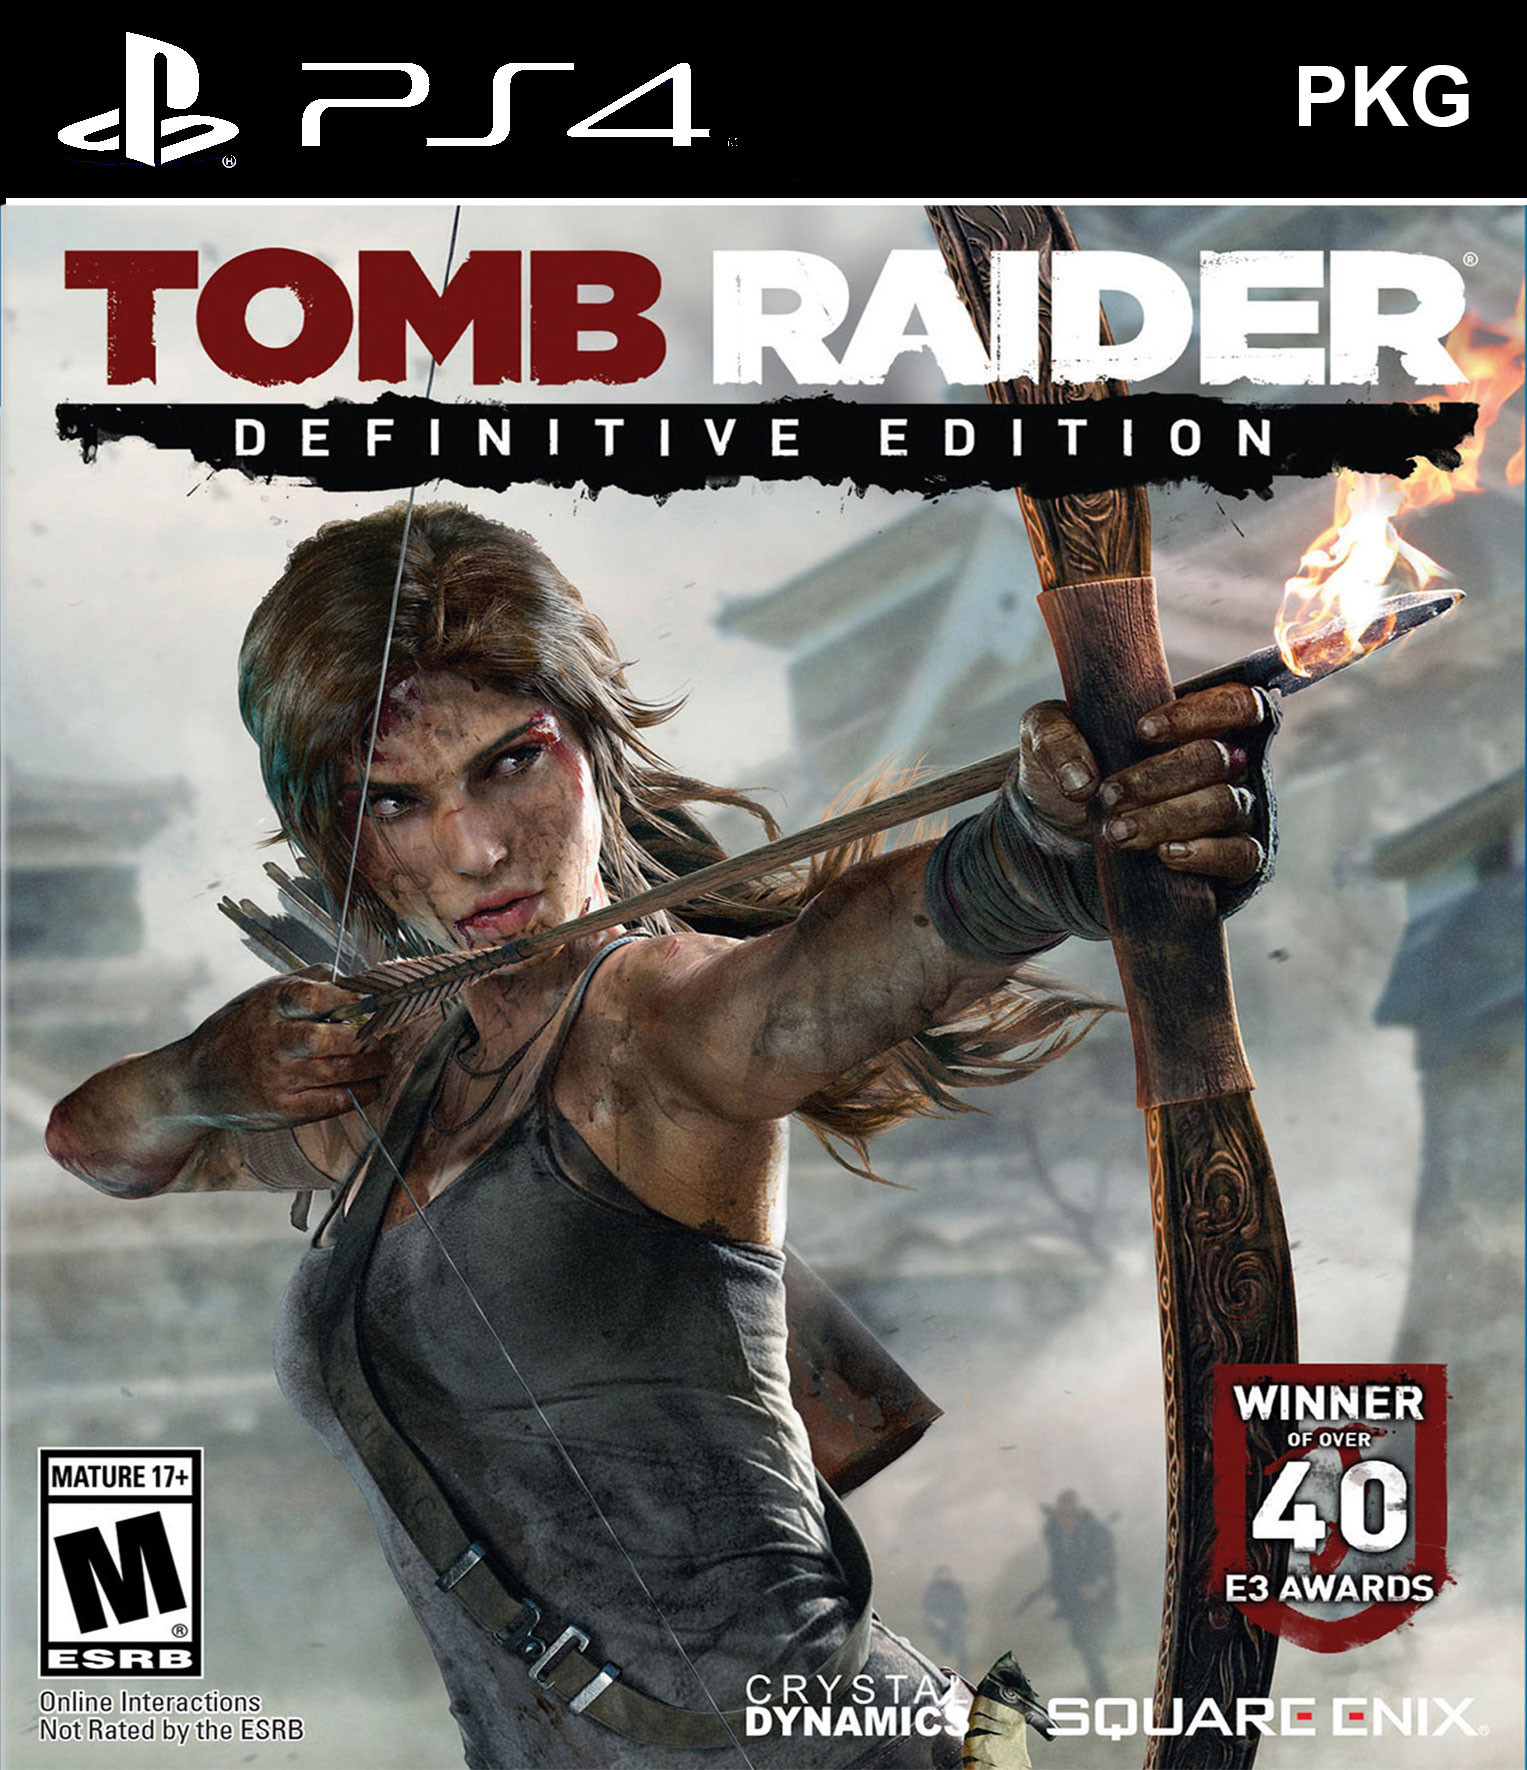 Tomb Raider: Definitive Edition PKG Oyun İndir [4.05